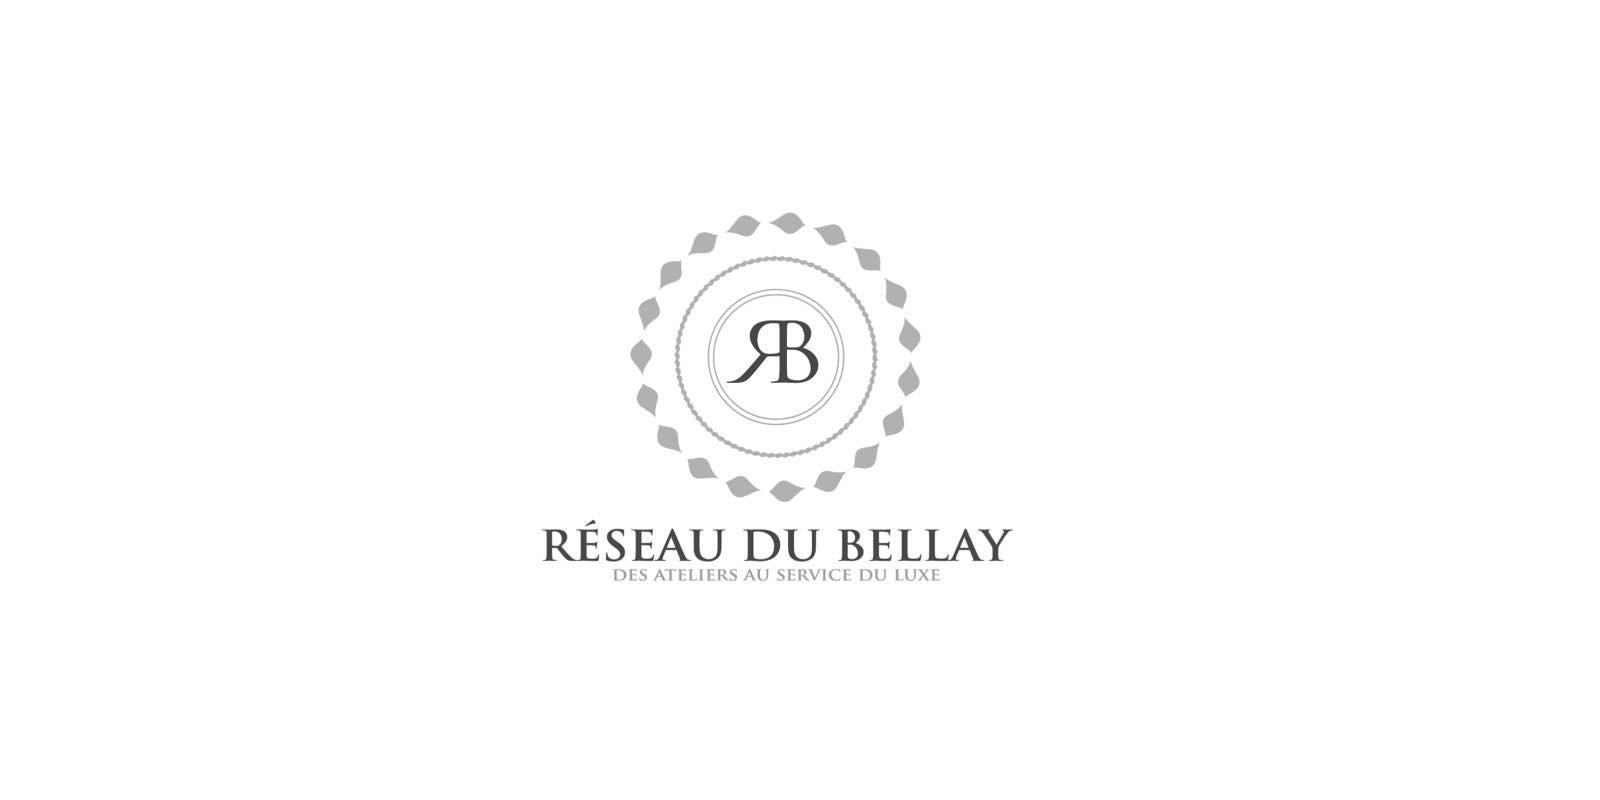 Réseau du Bellay